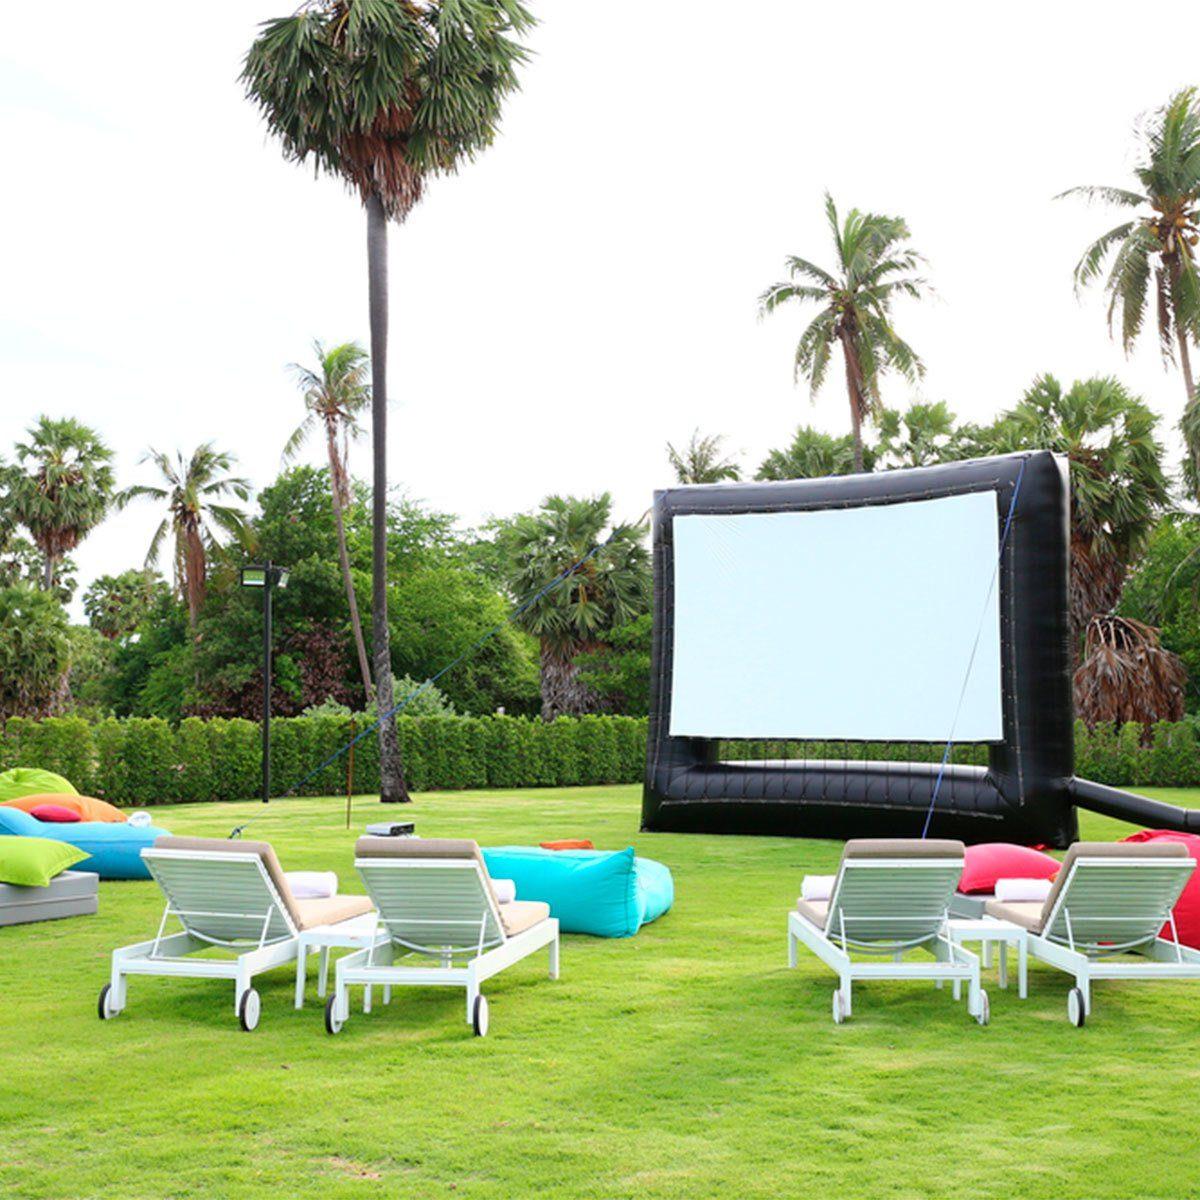 backyard projector screen